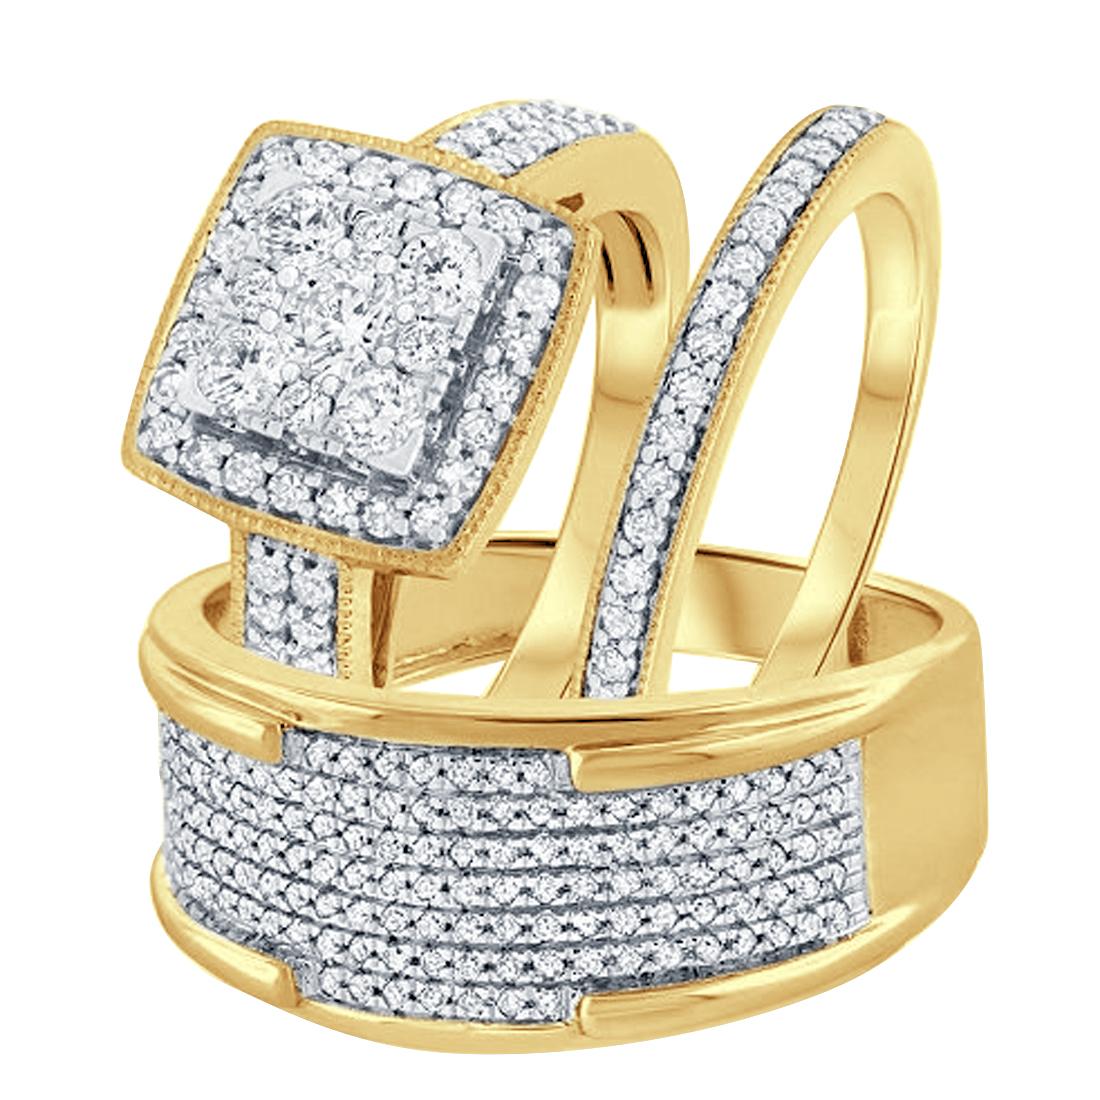 Men's & Women's 14k Yellow Gold Fn 3/8 Ct Round Diamond Trio Wedding Ring Set - $170.09